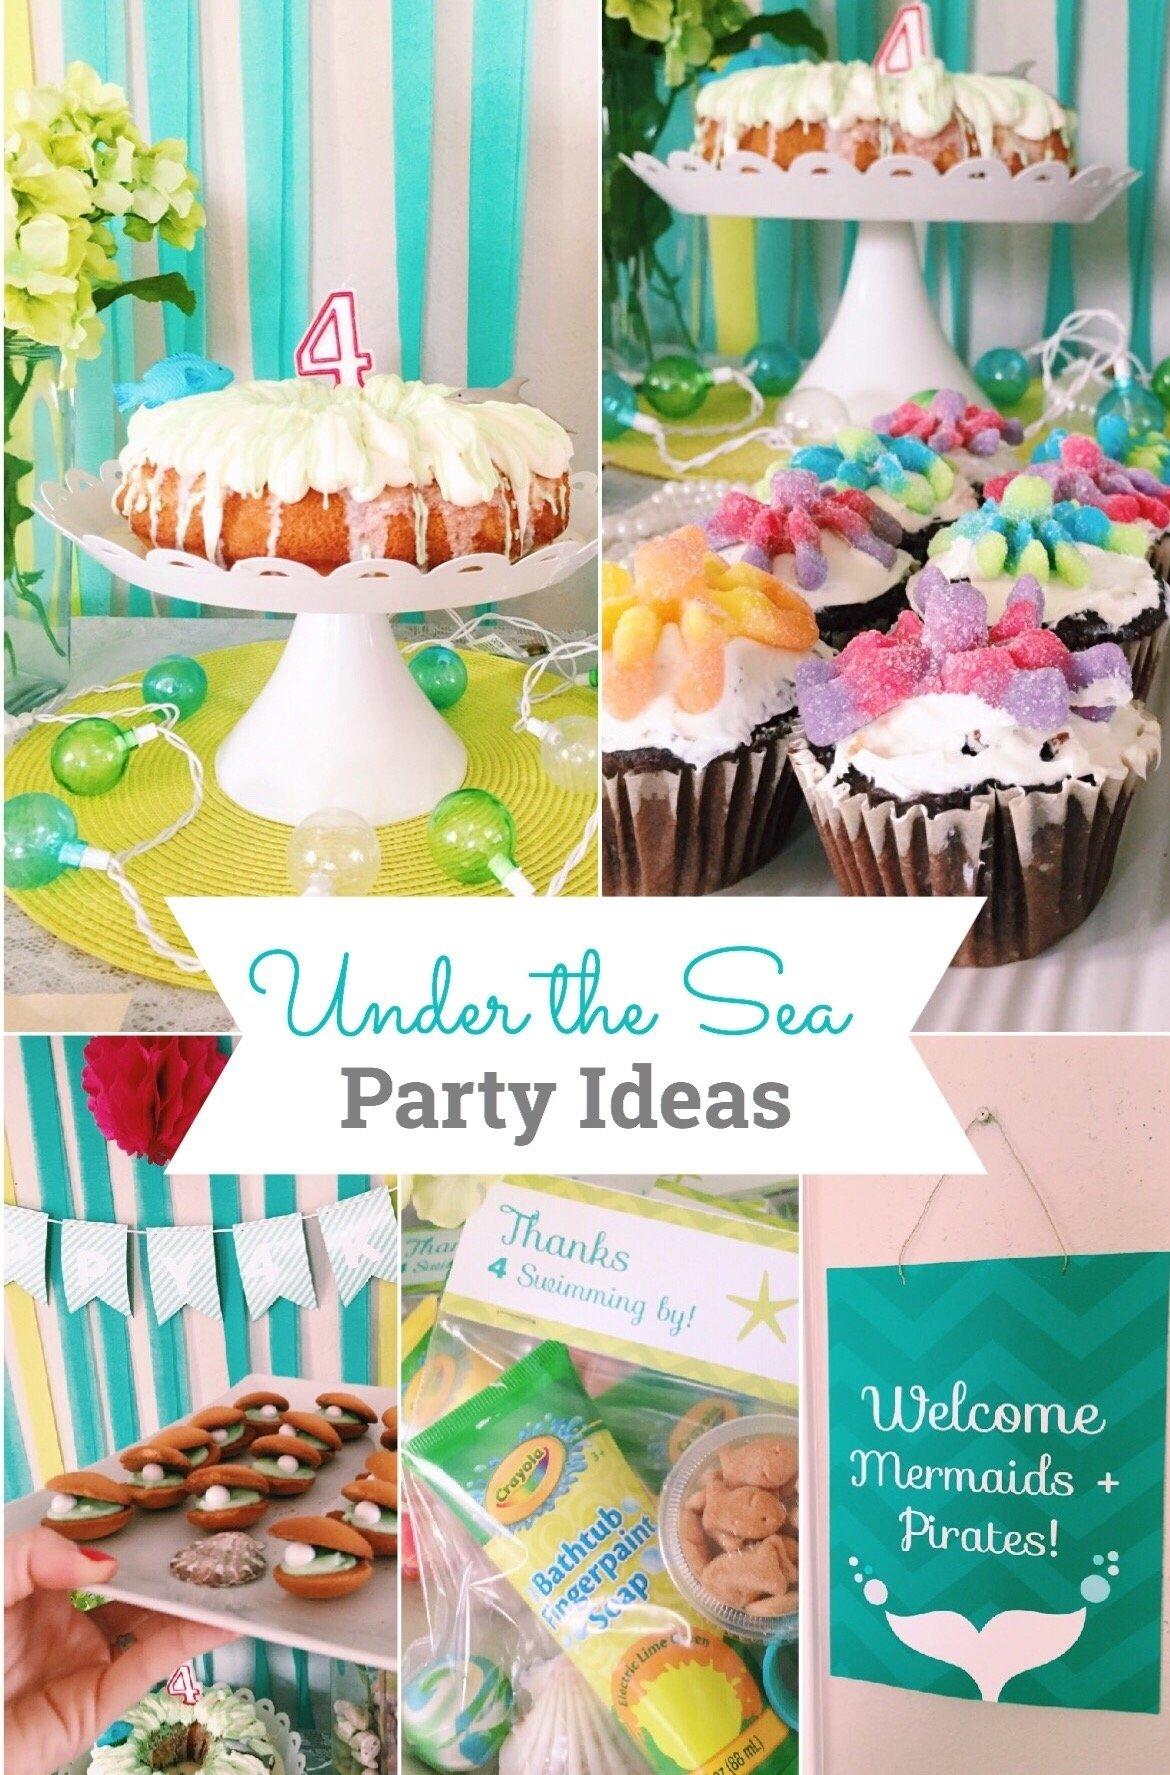 10 Attractive Under The Sea Party Ideas under the sea party ideas brigeeski 1